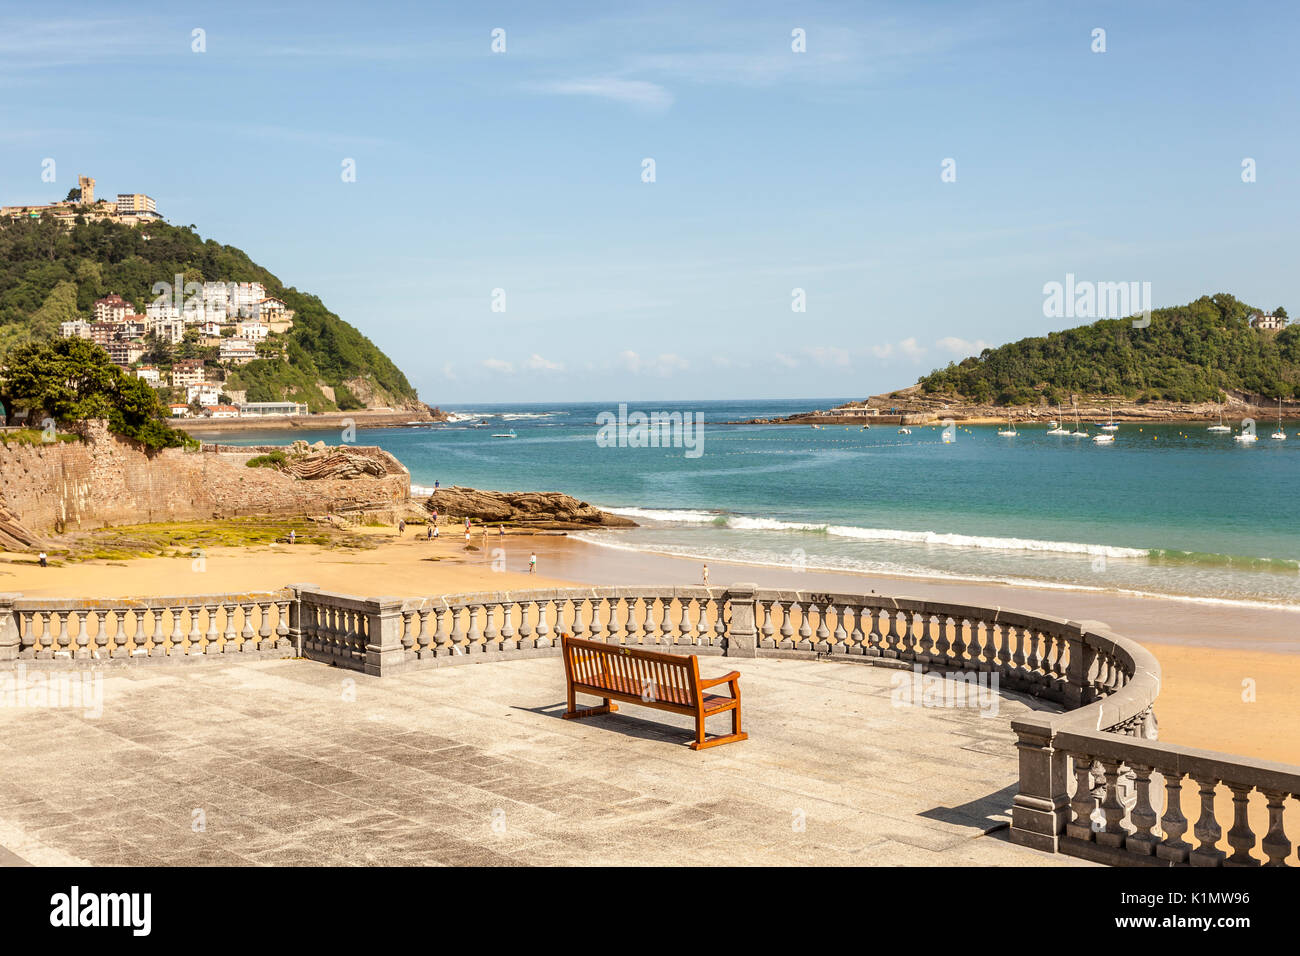 Promenade at the La Concha beach in San Sebastian, Donostia. Basque country, Spain - Stock Image